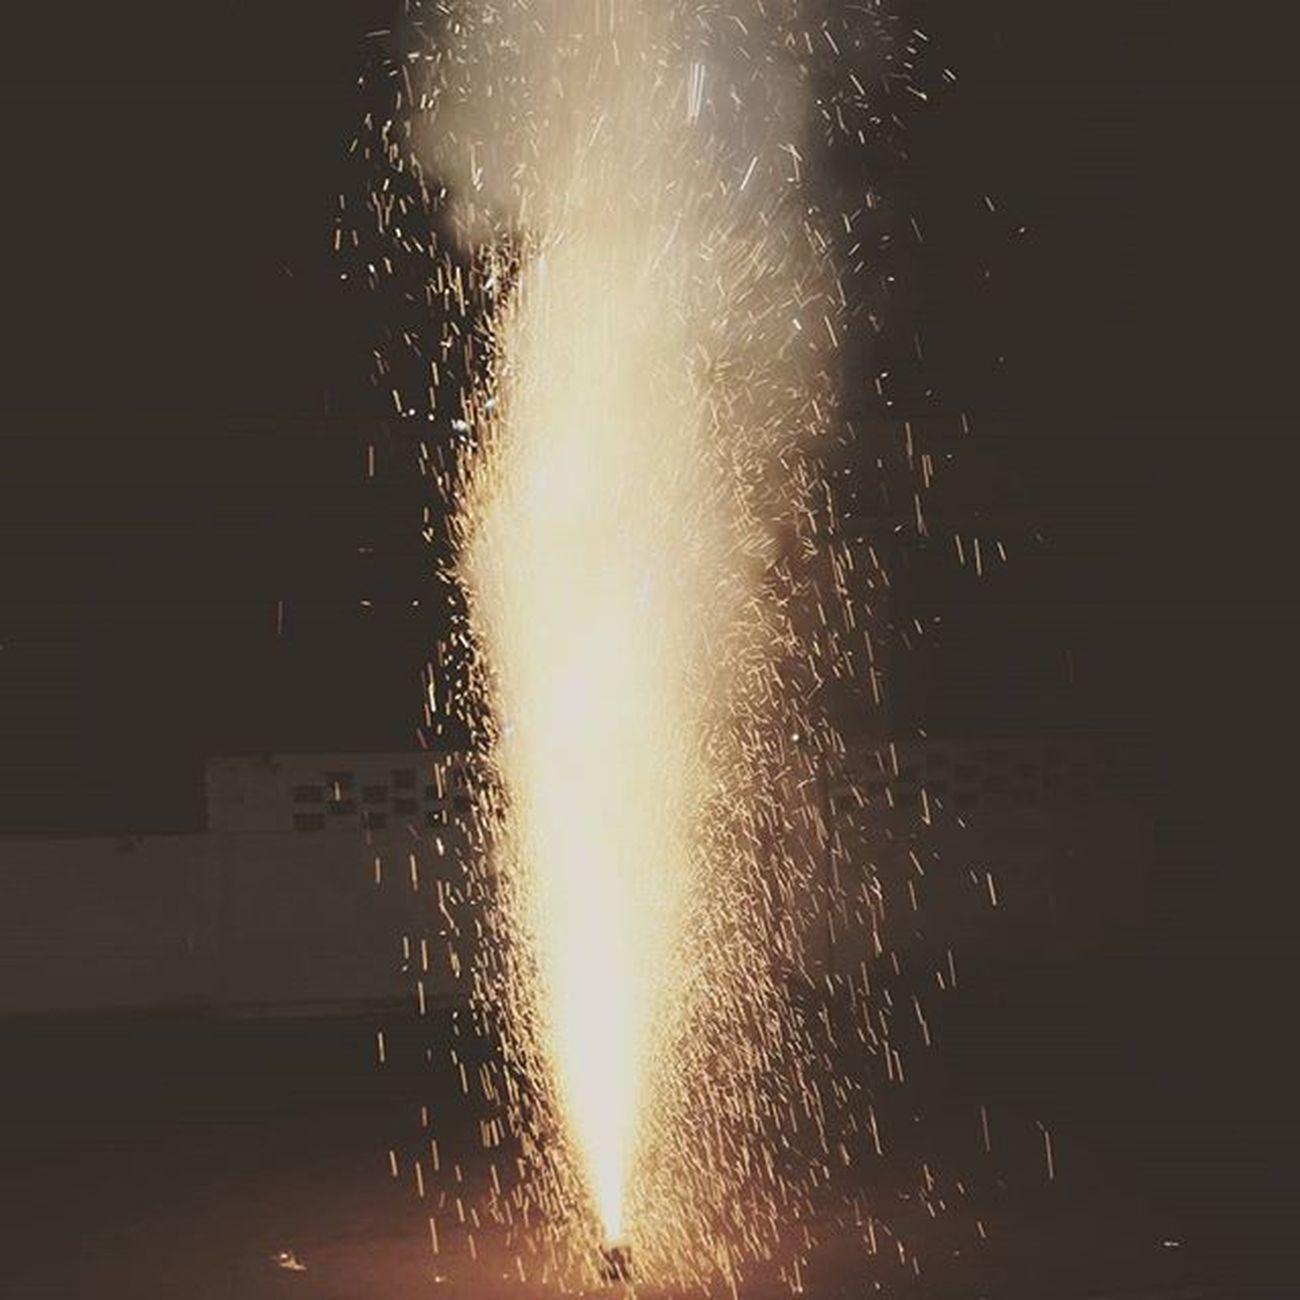 ex diwali Crackers Hdrphotography Photographyislifee Anaar Diwali2015 DSLR